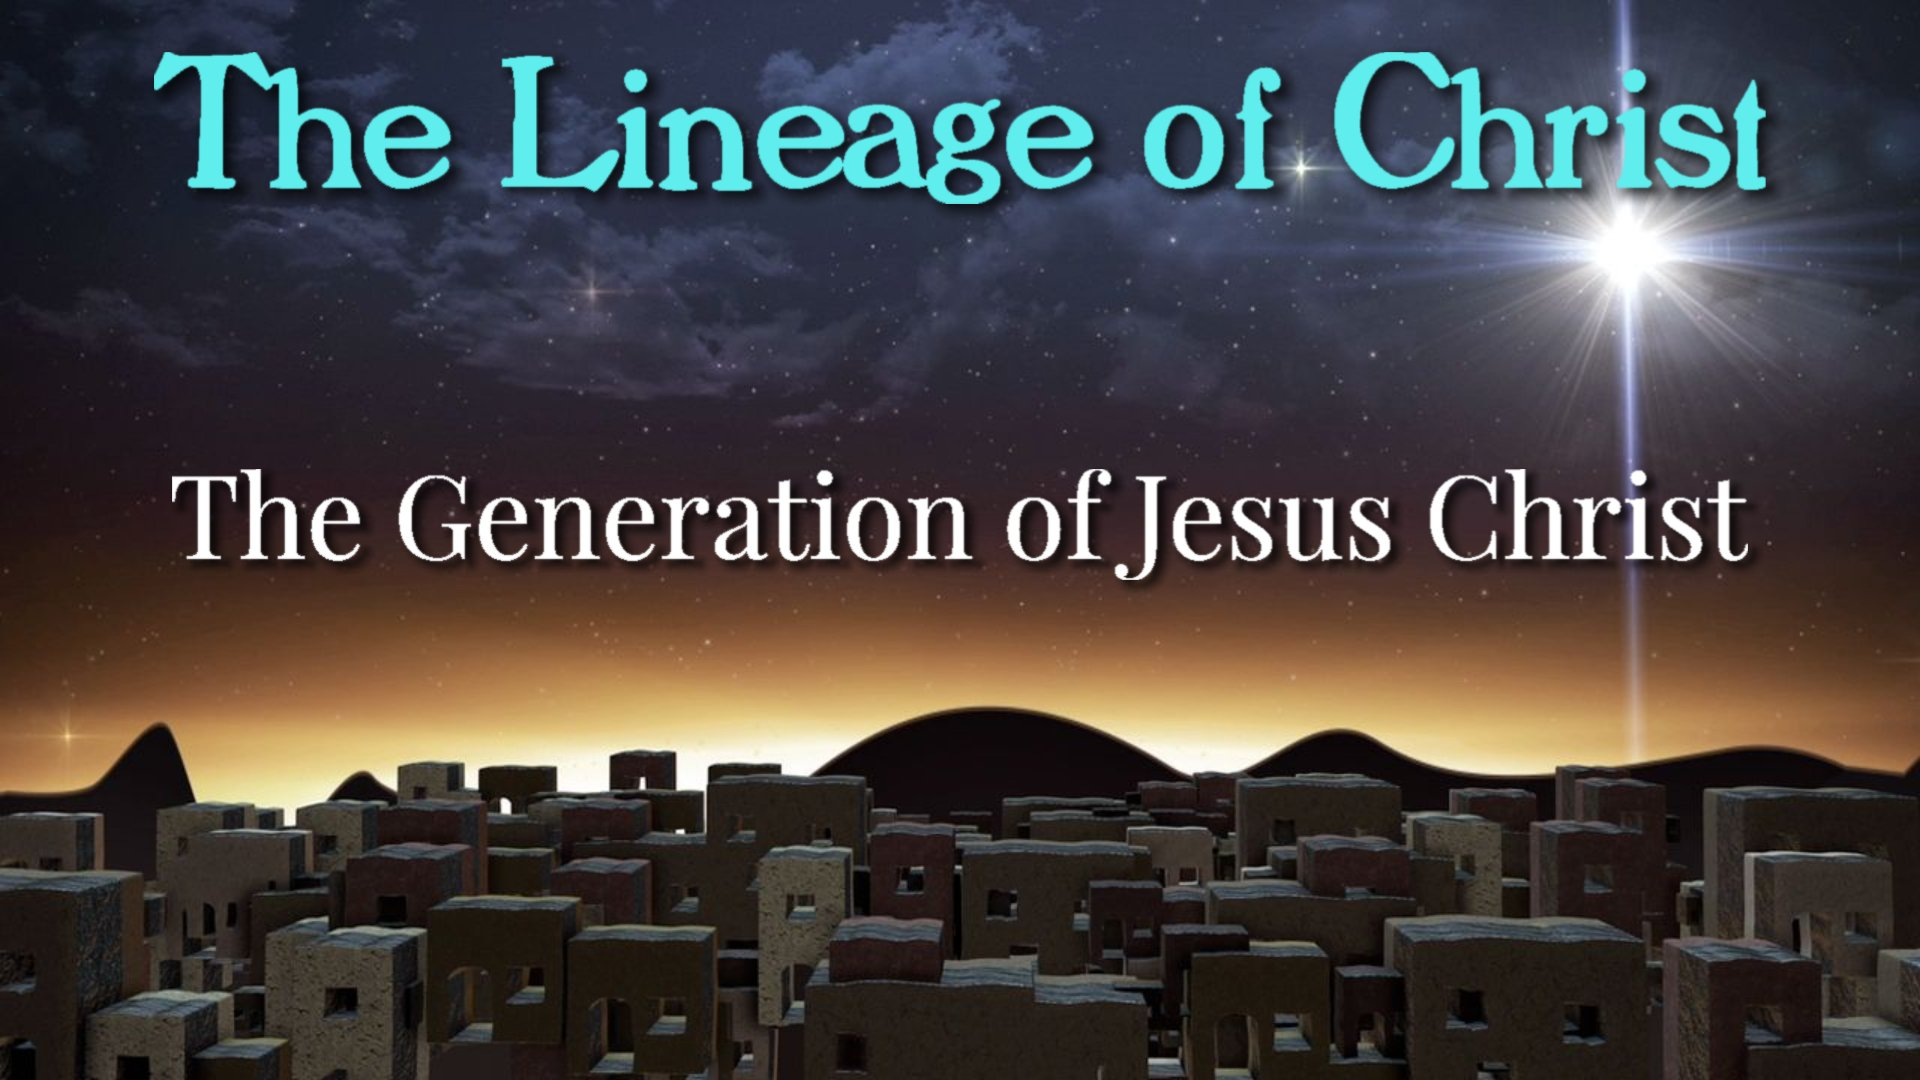 01 The Generation of Jesus Christ